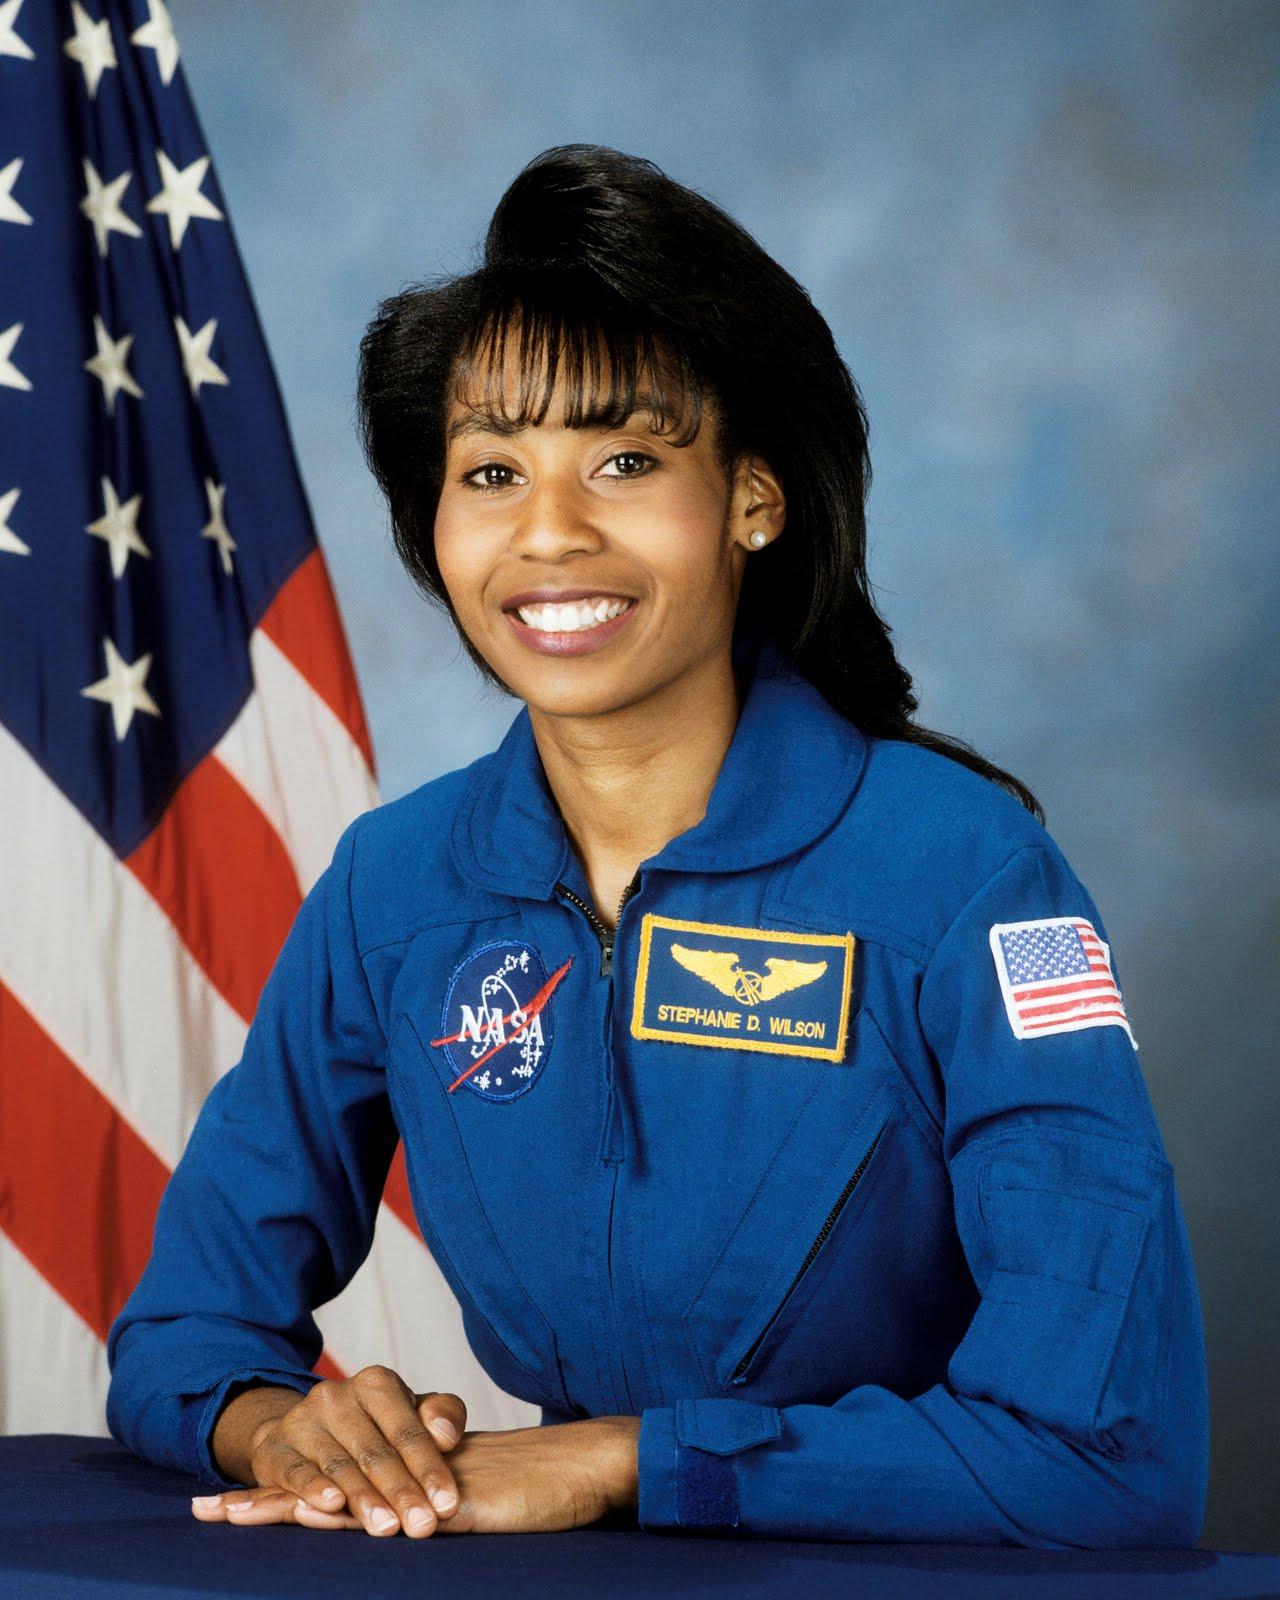 stephanie wilson astronaut - photo #1